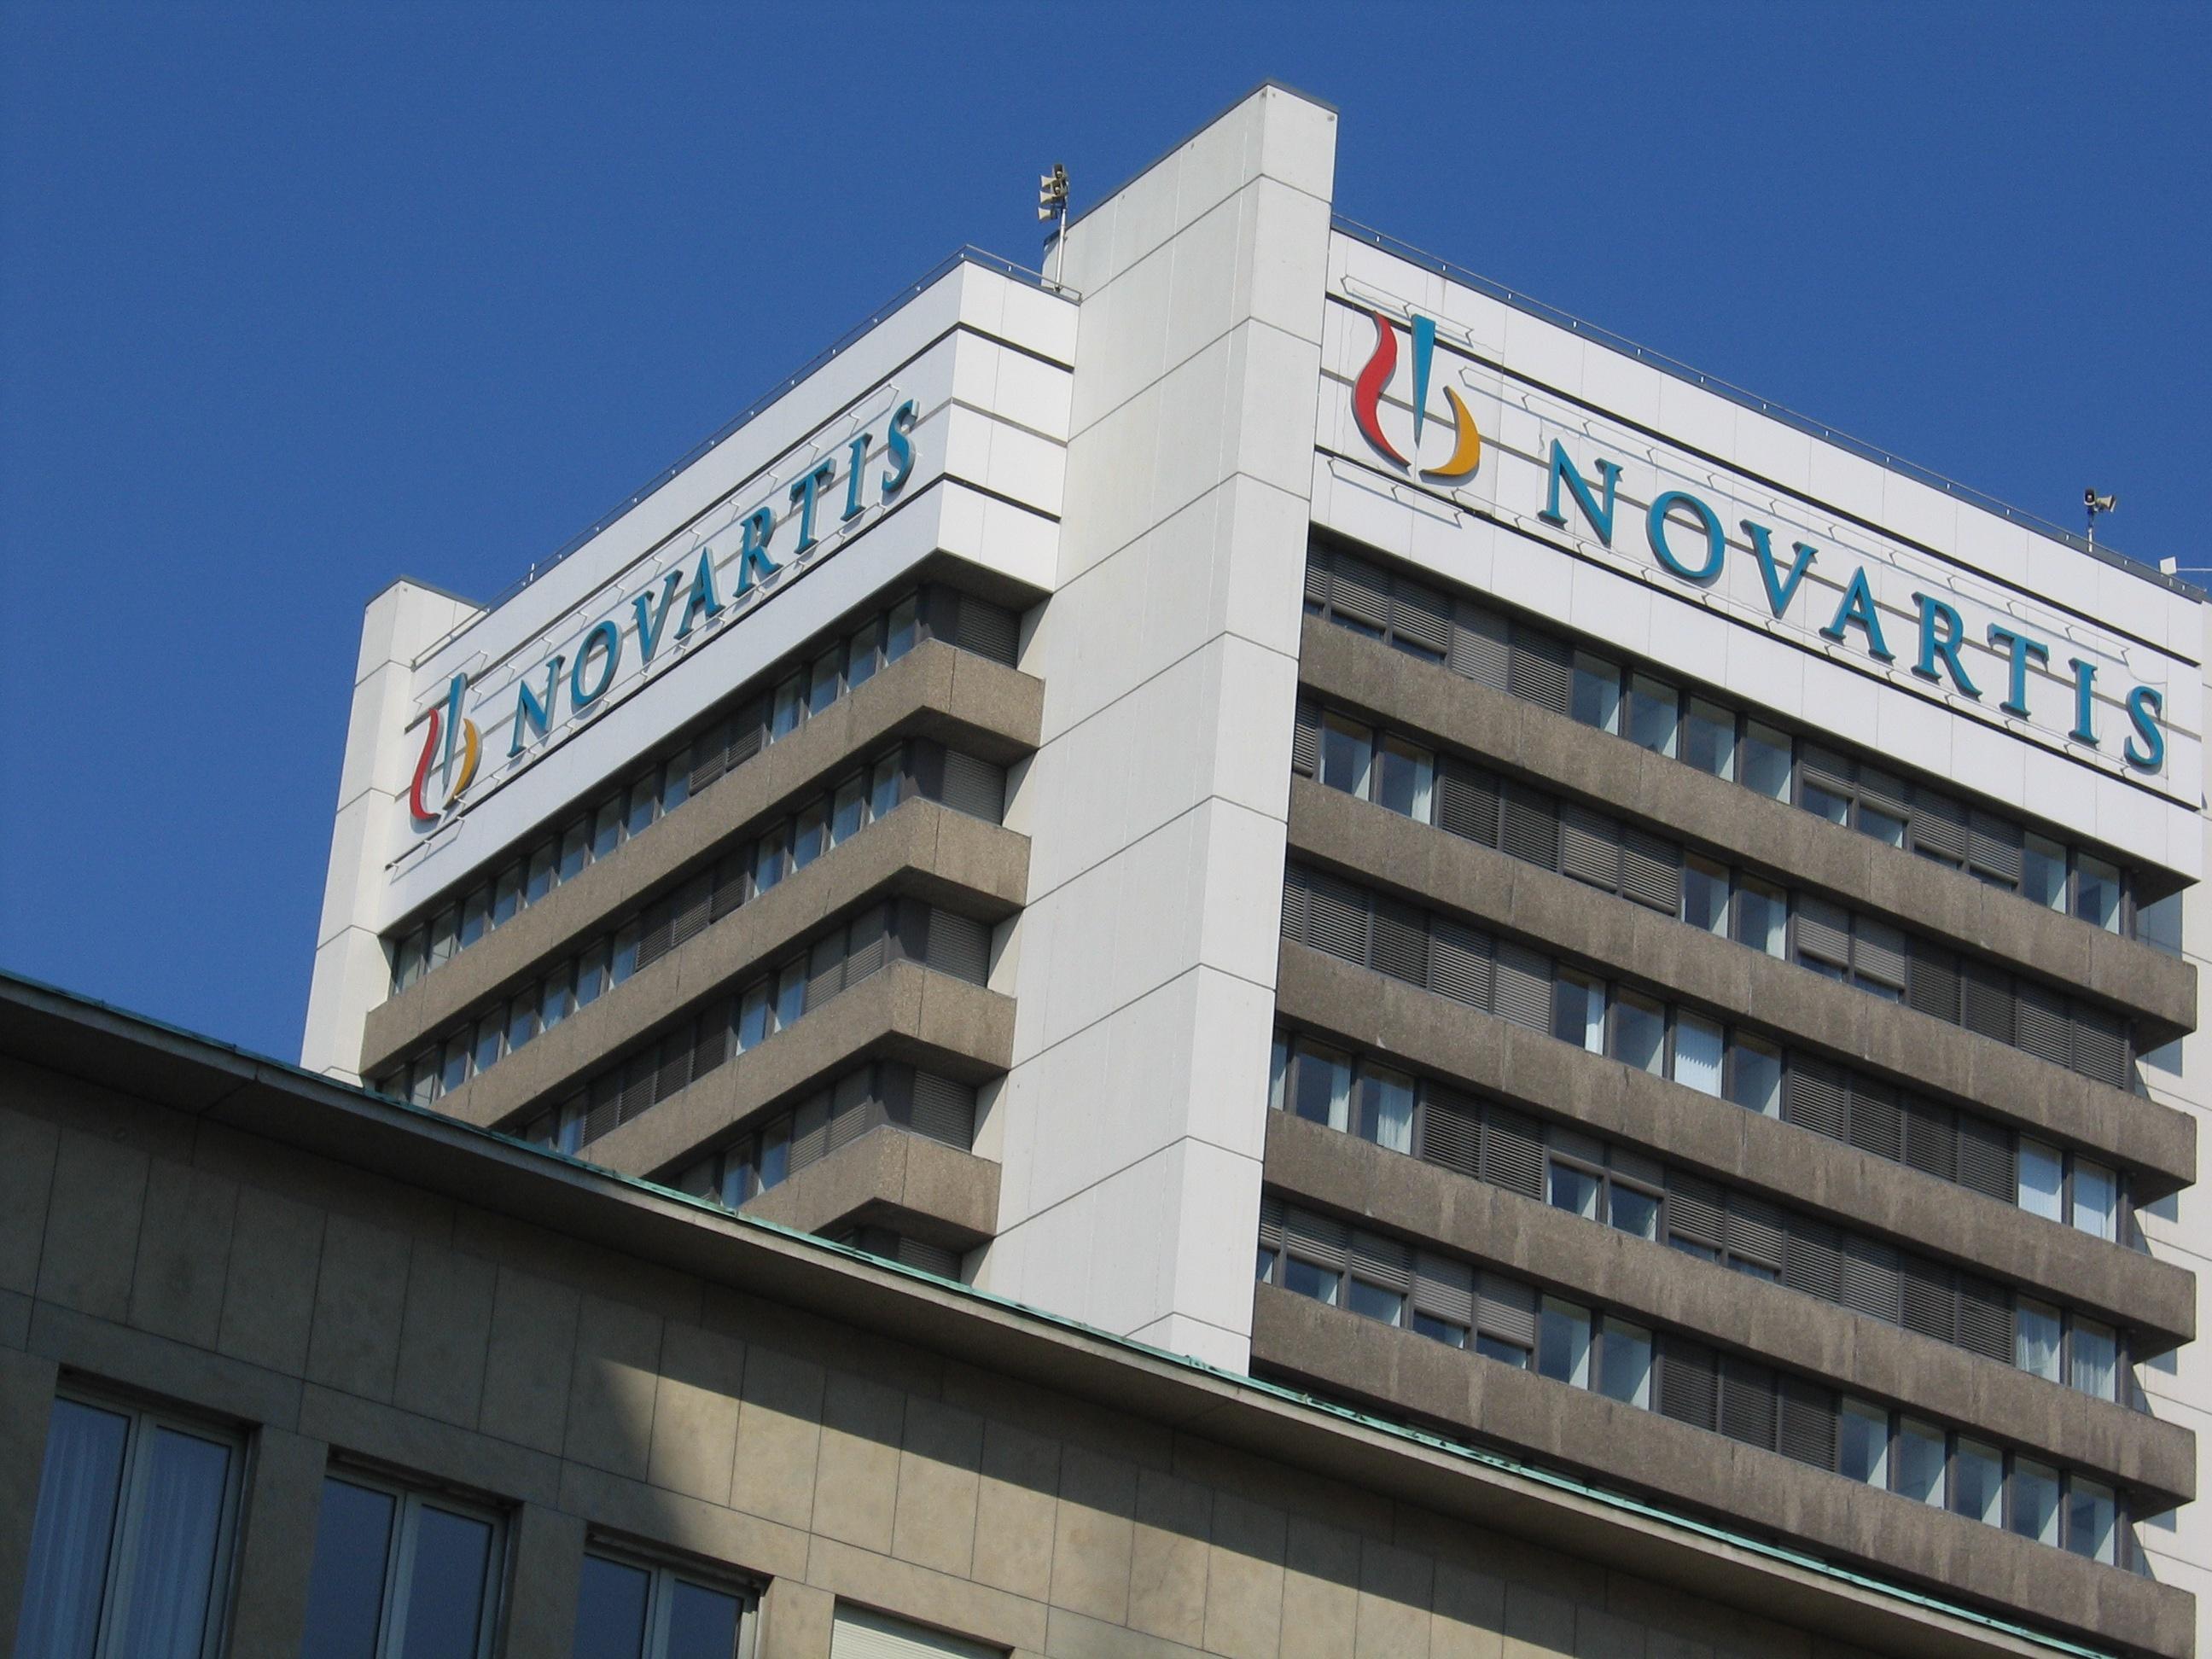 Novartis confirmará en el congreso europeo de esclerosis múltiple la eficacia a largo plazo de »Gilenya»